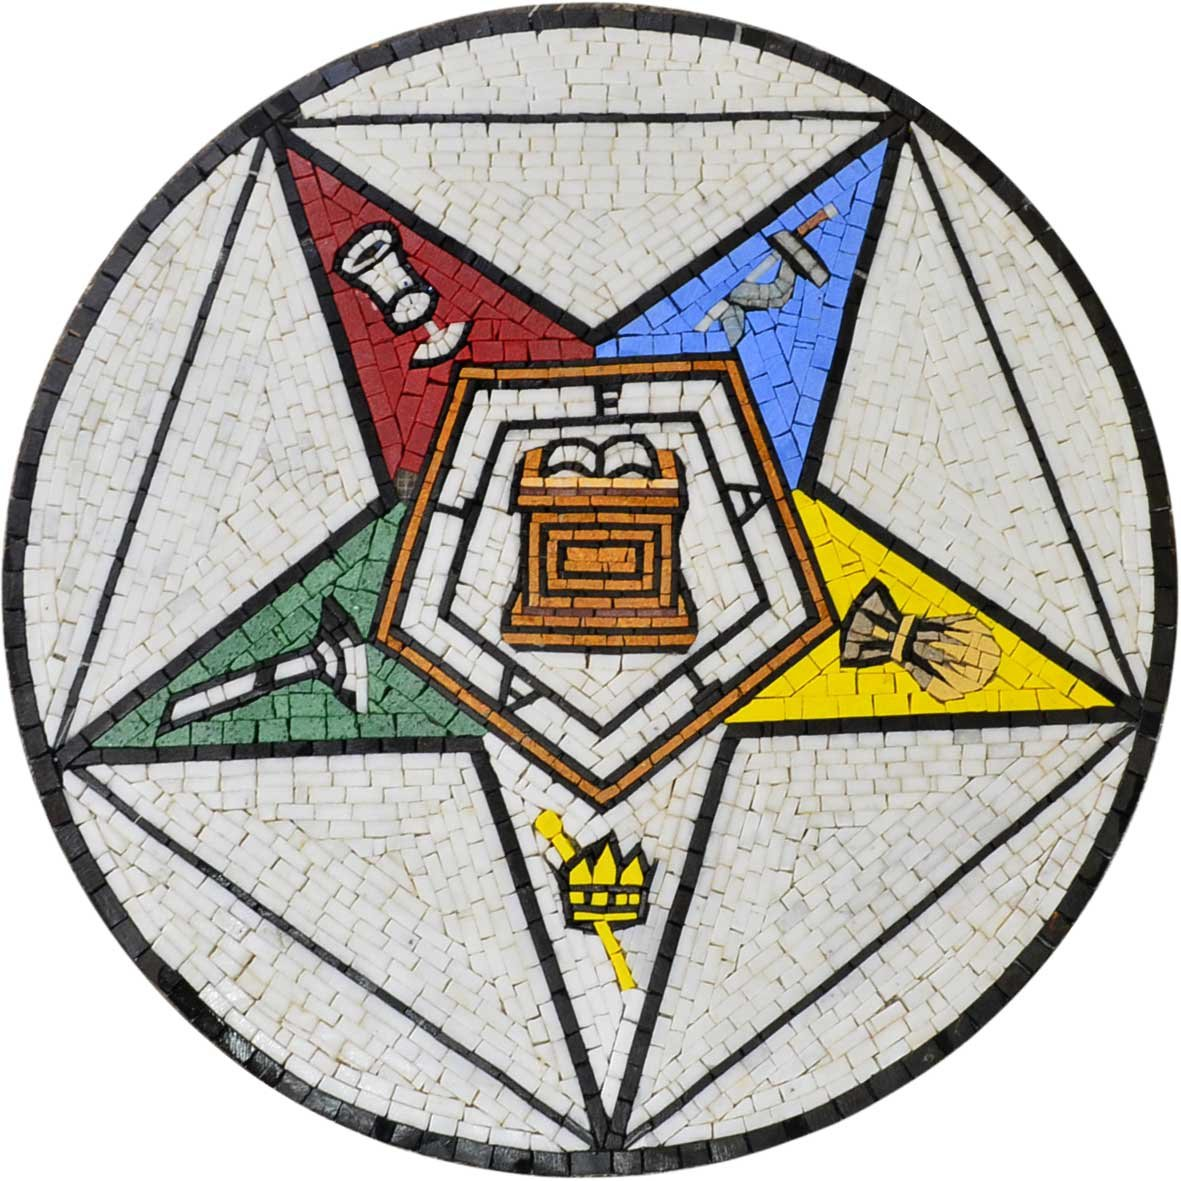 Custom Medallion Mosaic of The Masonic Eastern Star